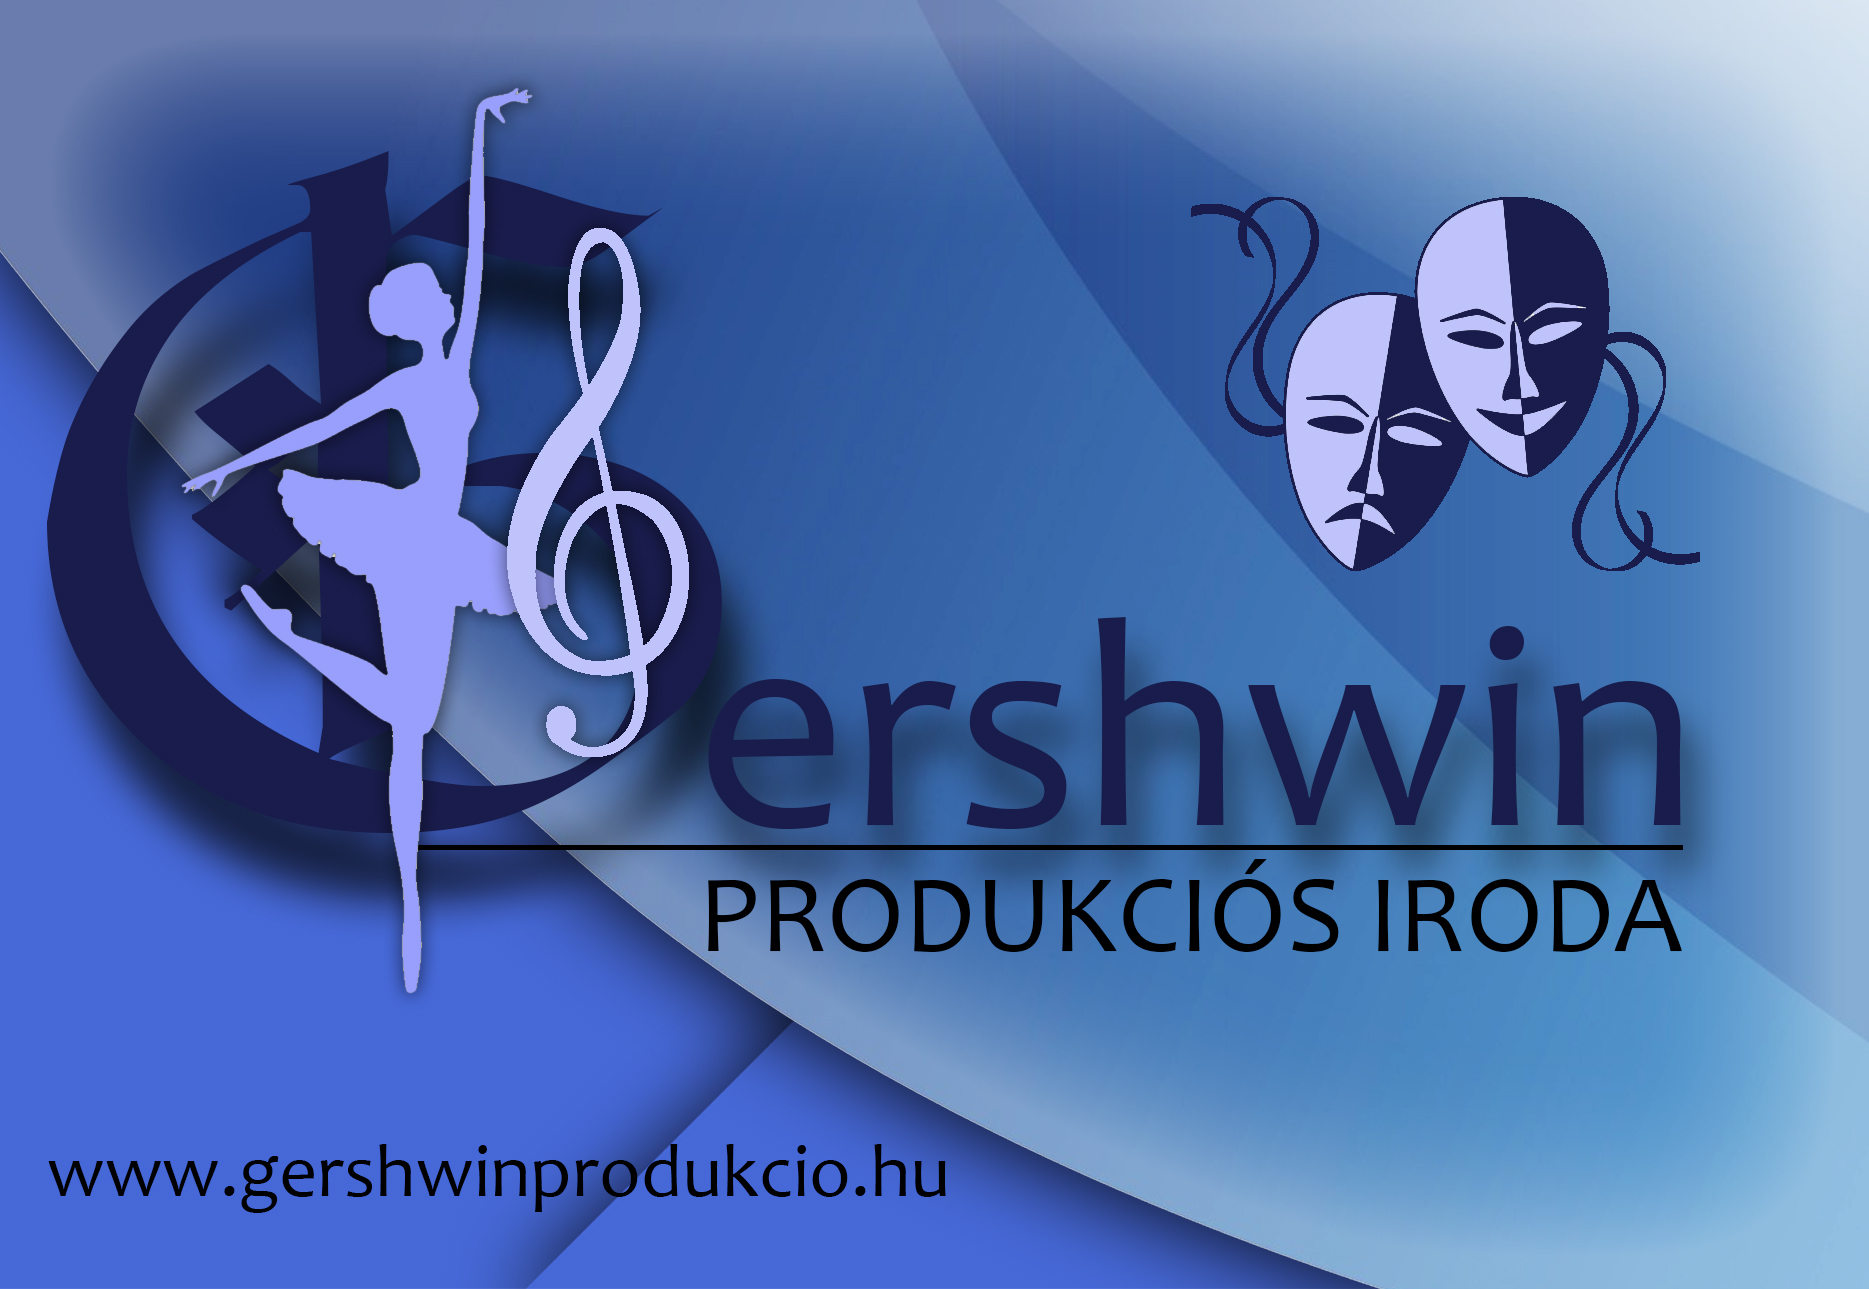 Gershwin Produkciós Iroda